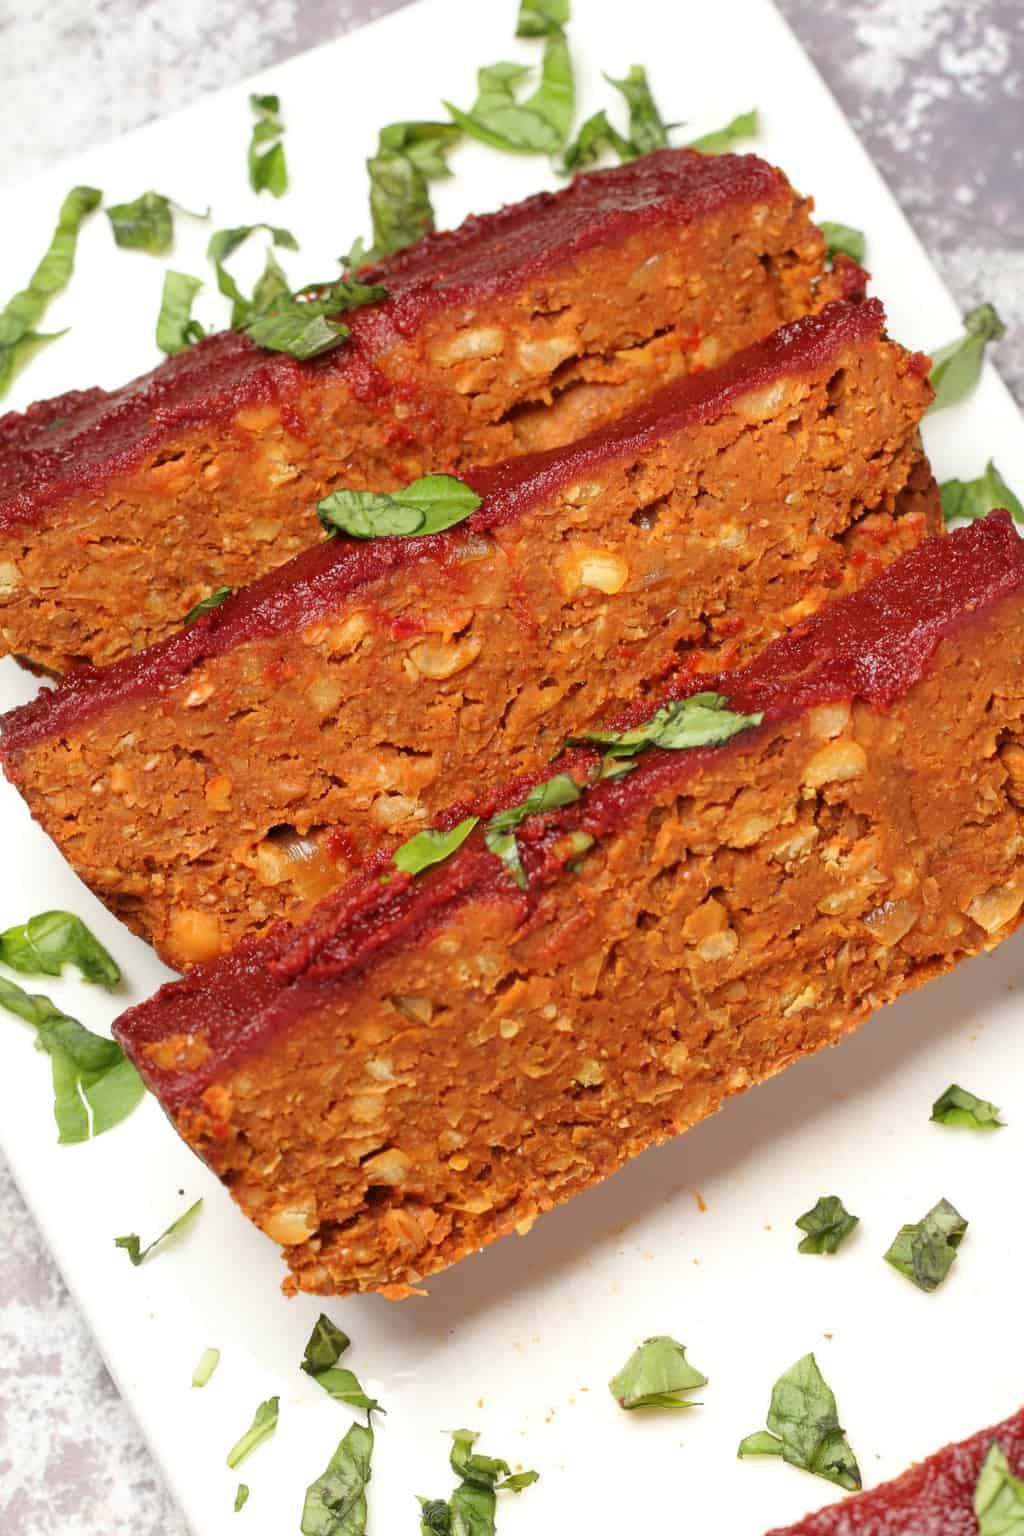 Vegan meatloaf slices on a white plate.